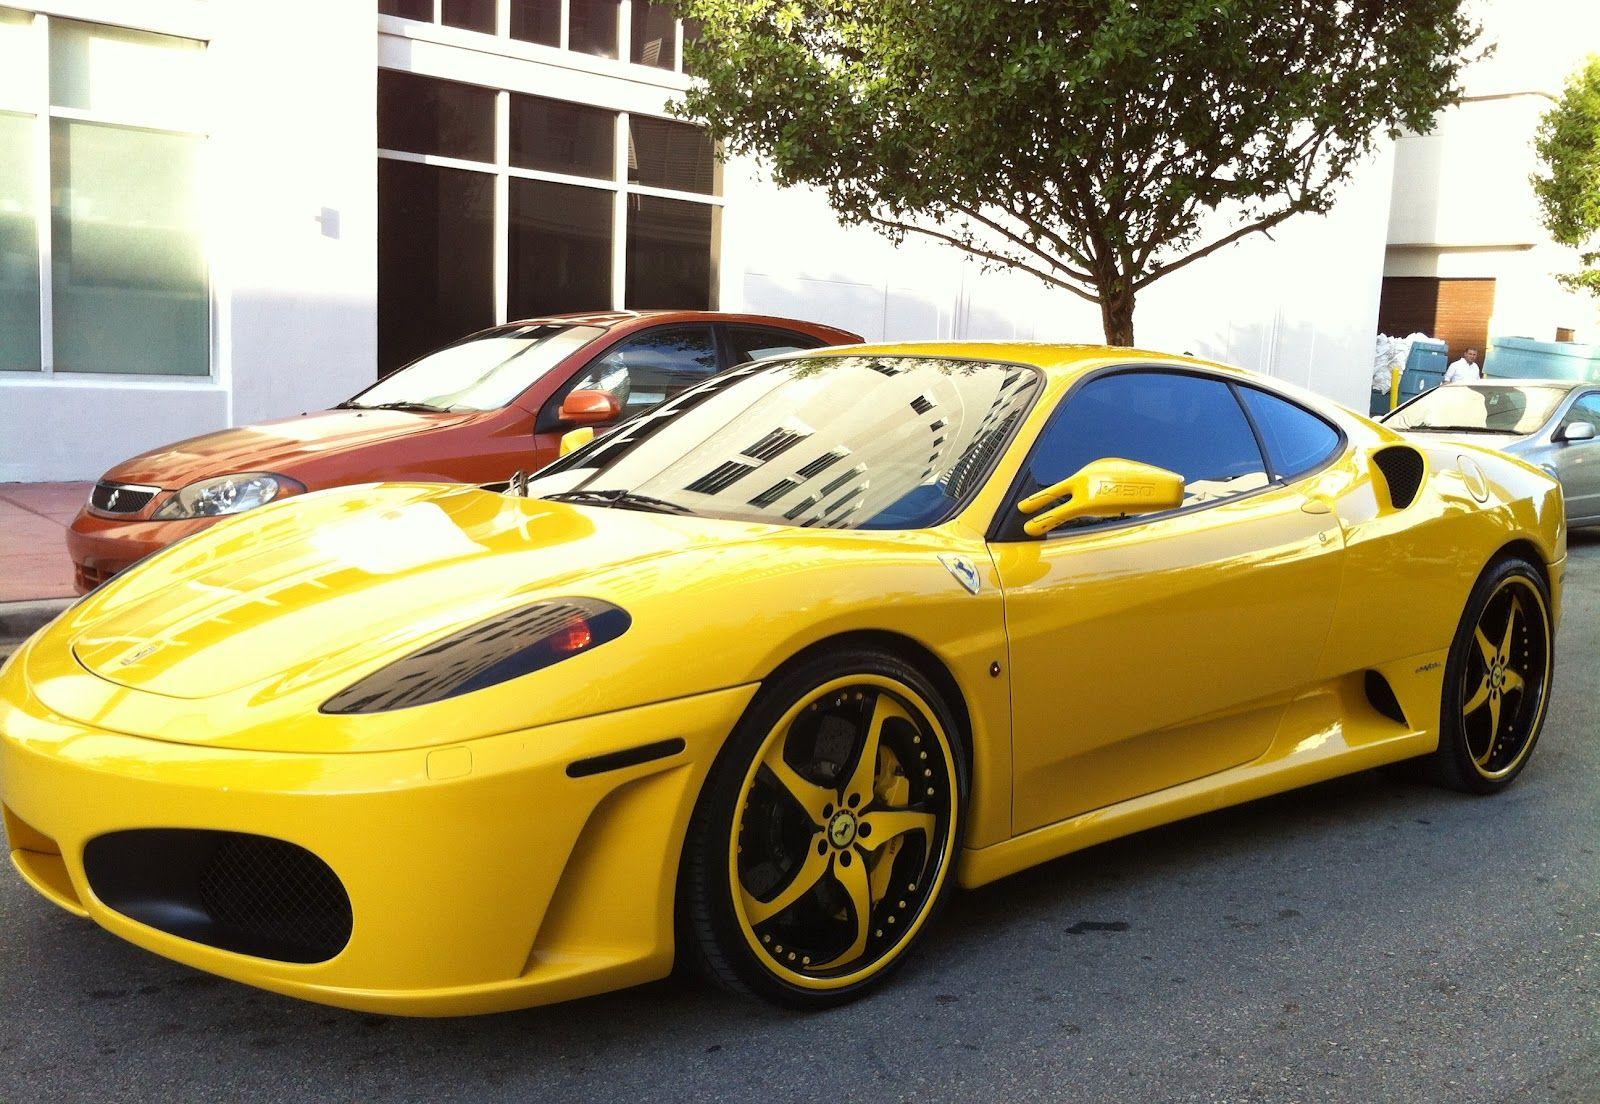 Cars colored yellow - Wheels Wheels Yellowferrarisportdream Carswheels